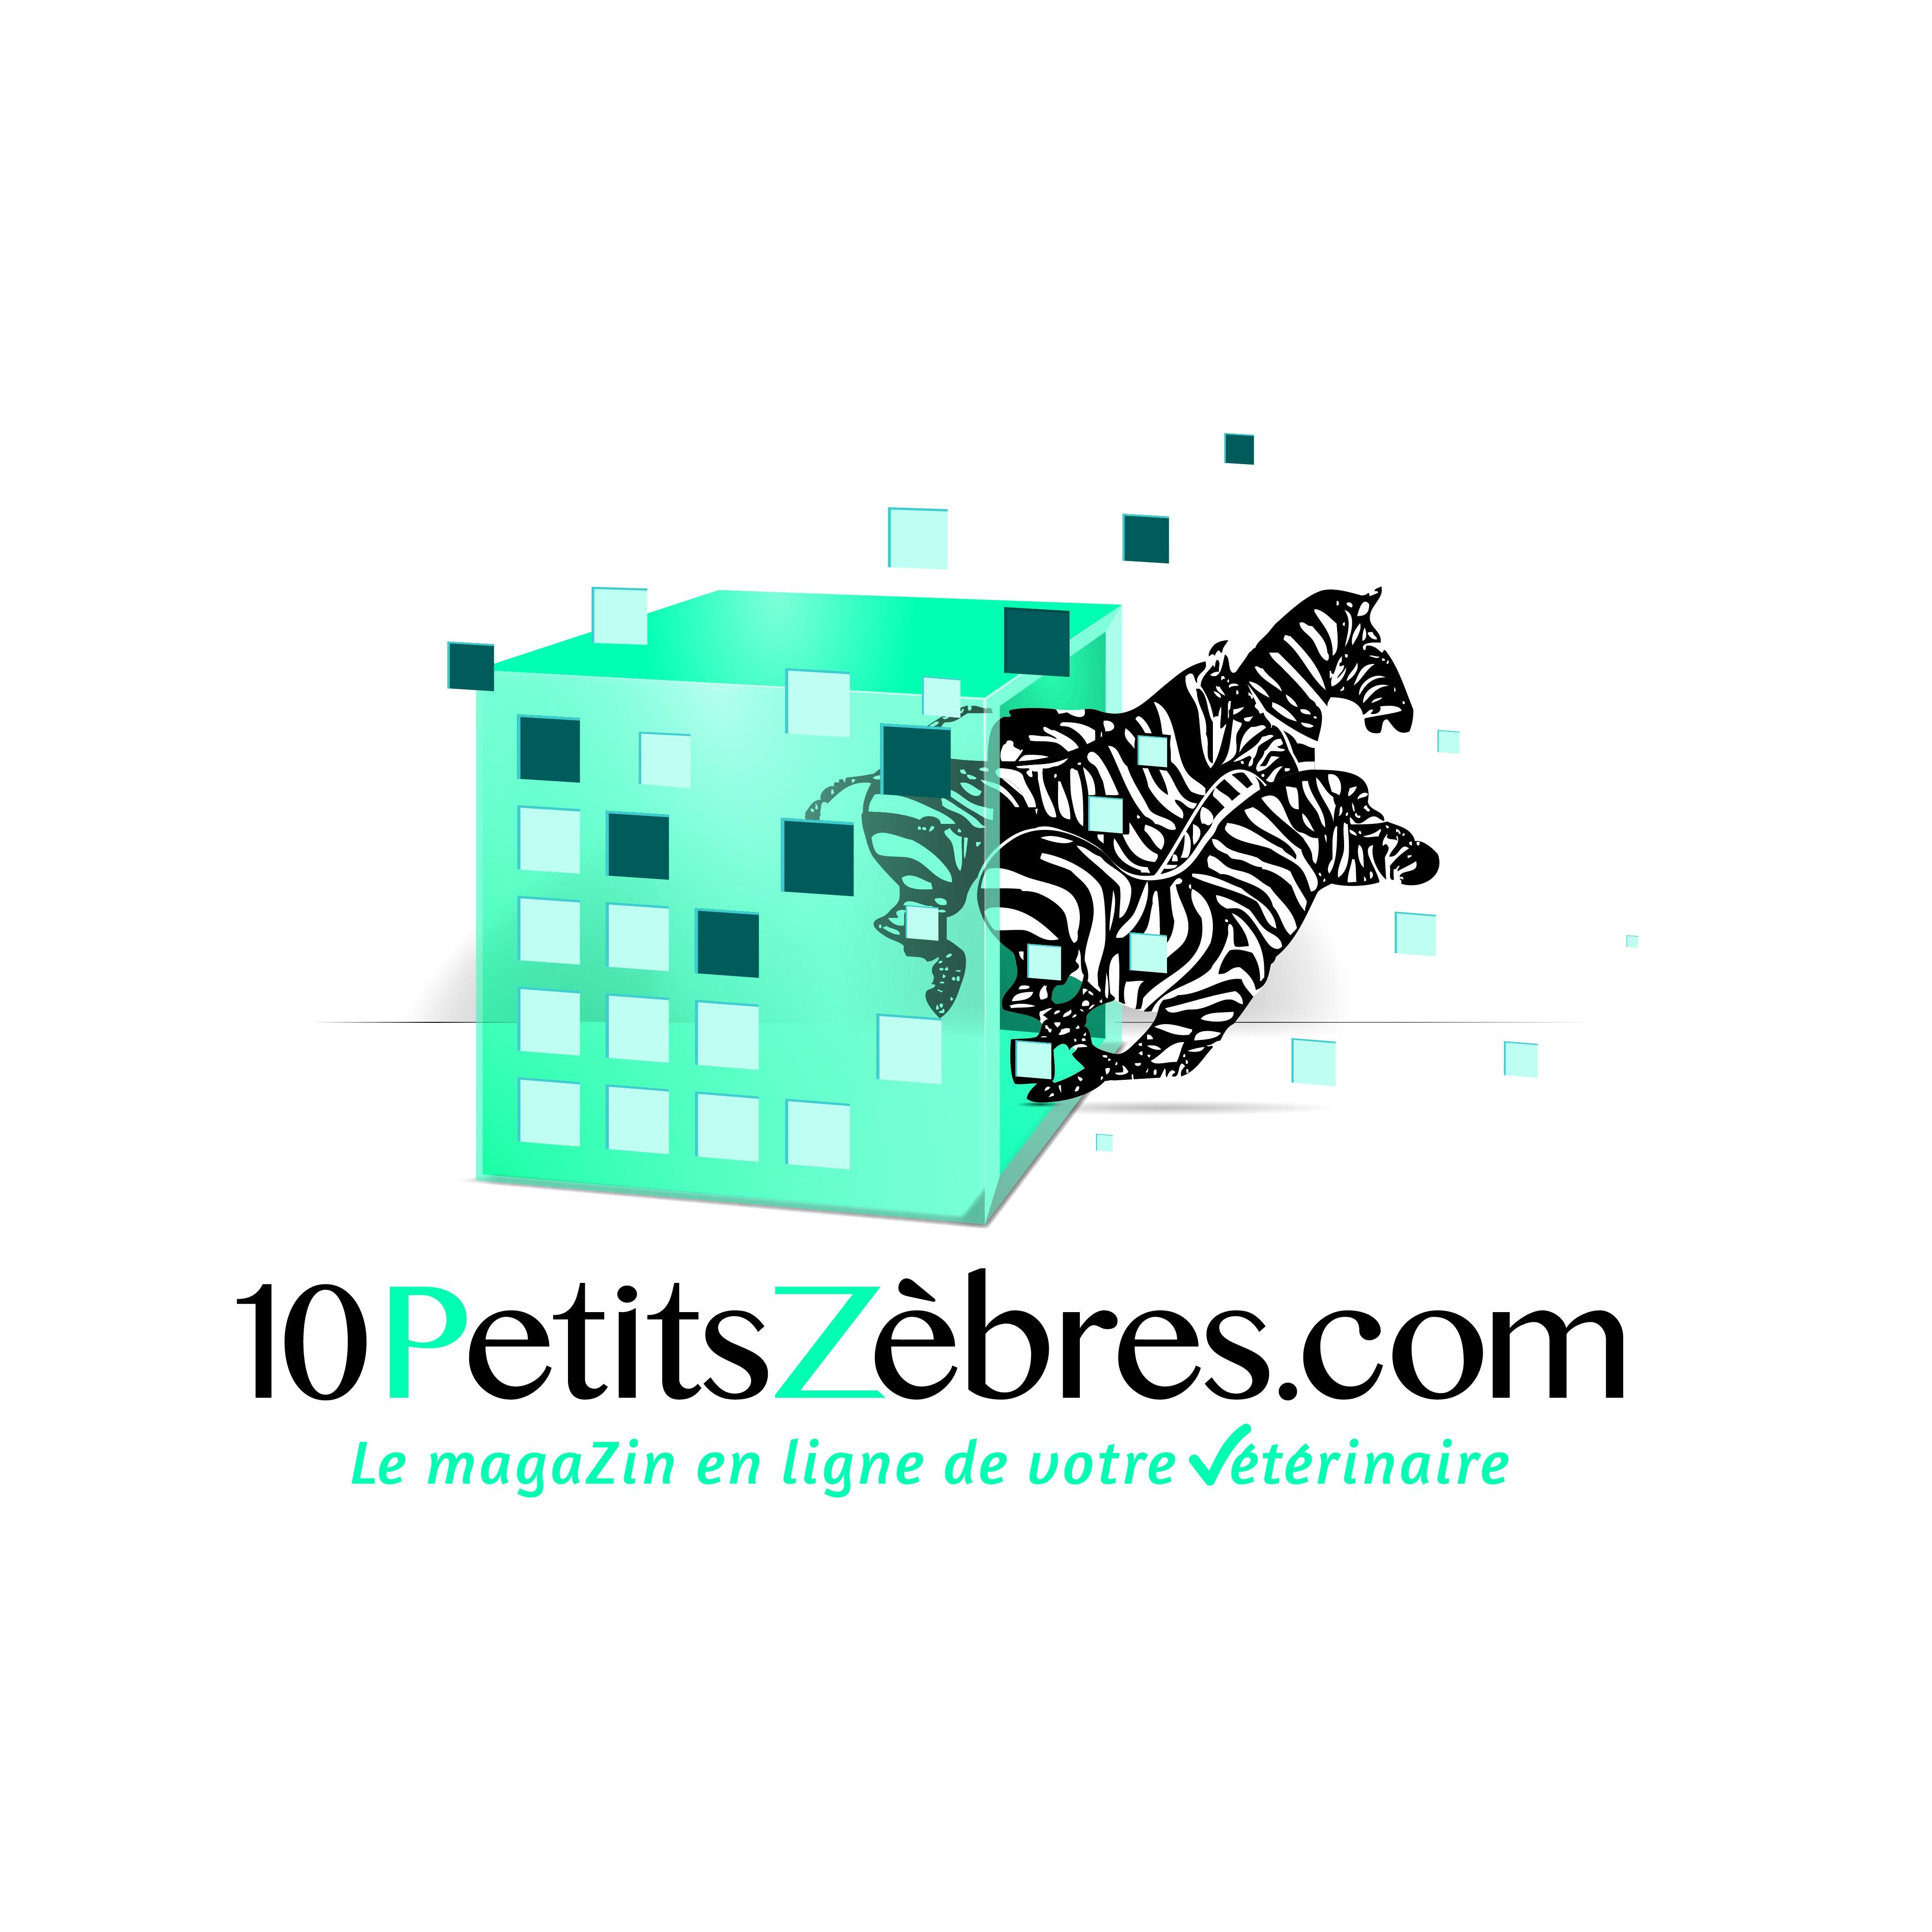 10 Petits Zèbres